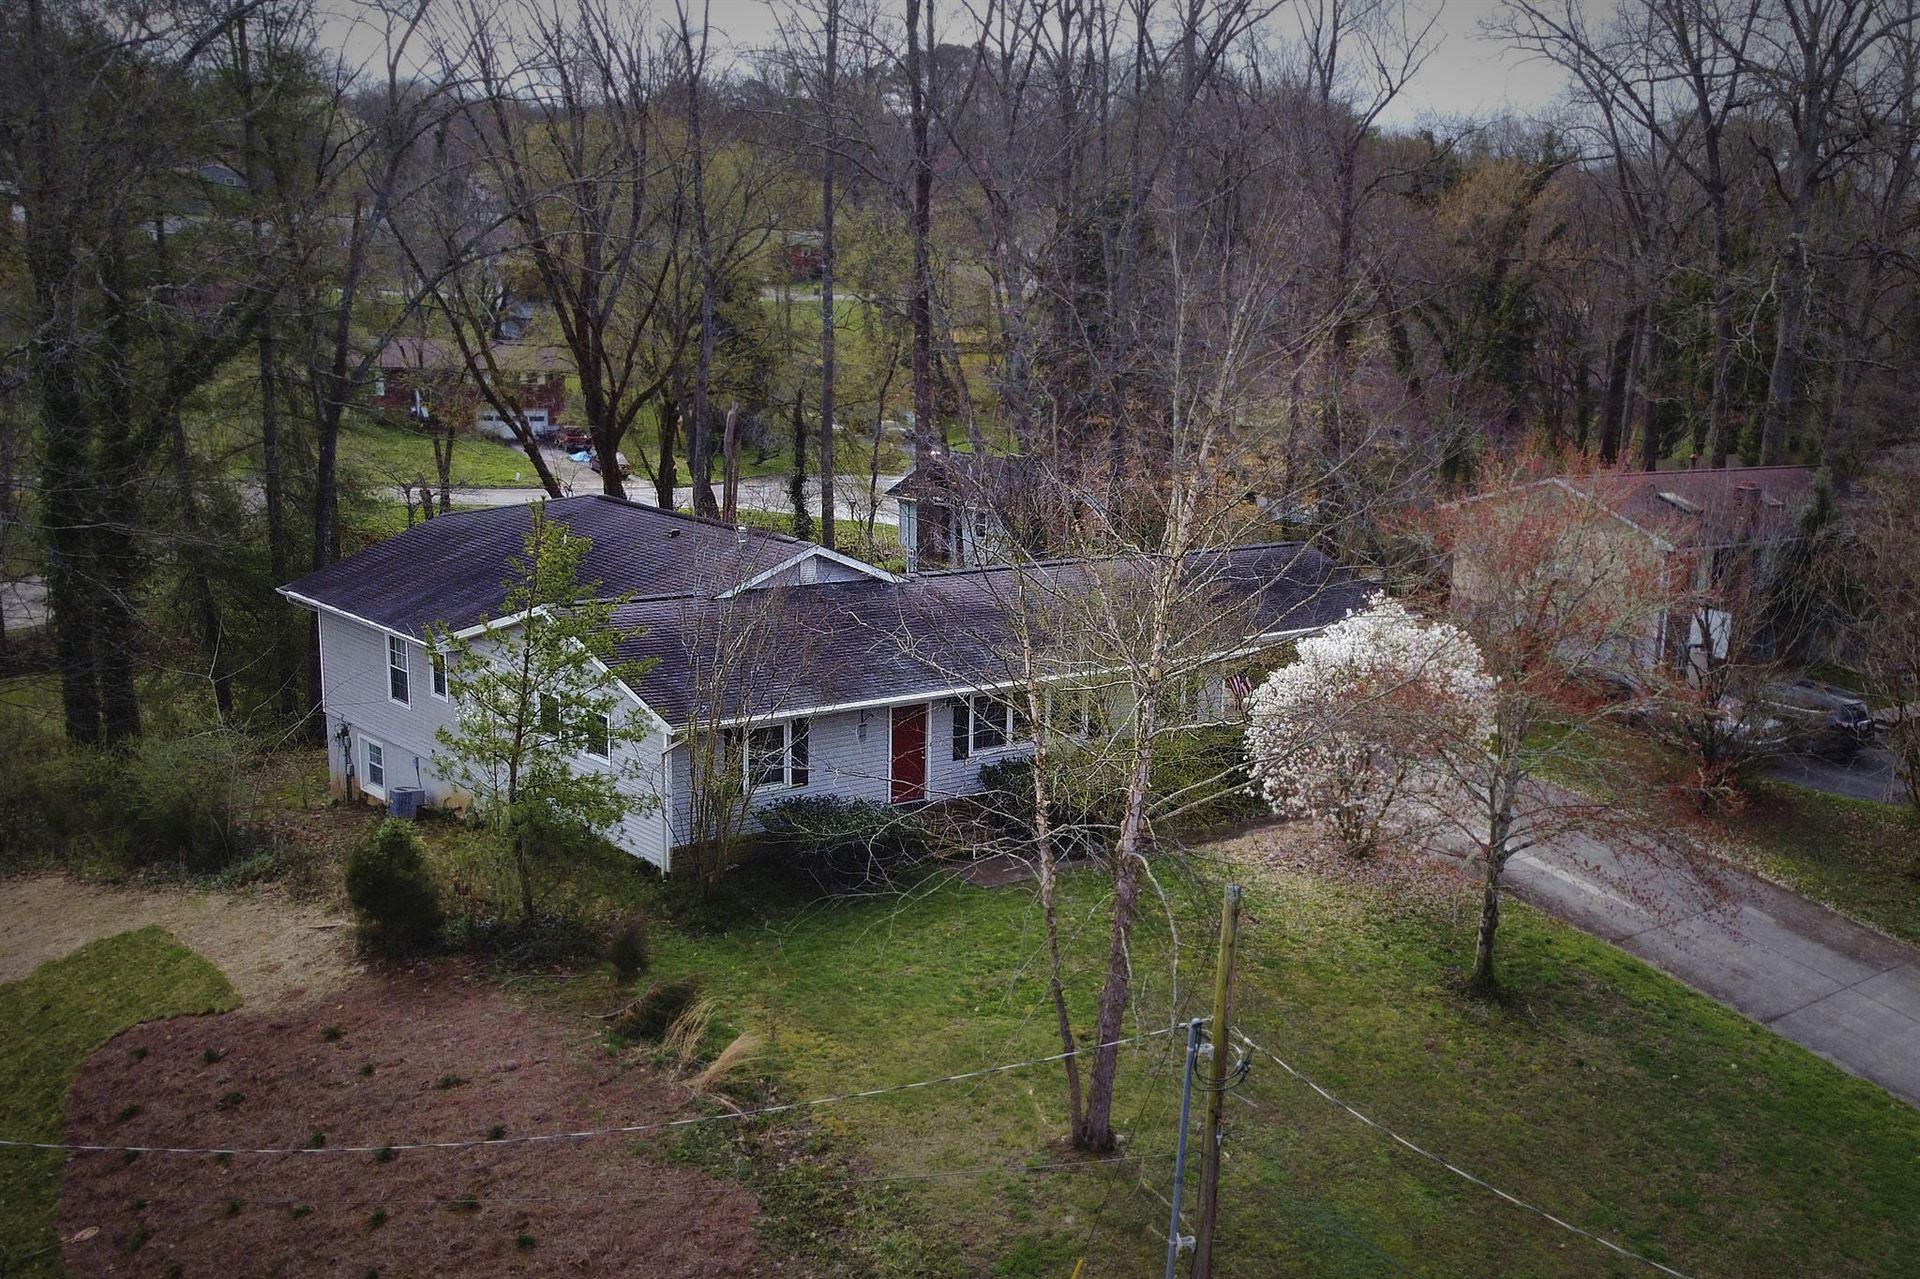 Photo of 122 Culver Rd, Oak Ridge, TN 37830 (MLS # 1146956)